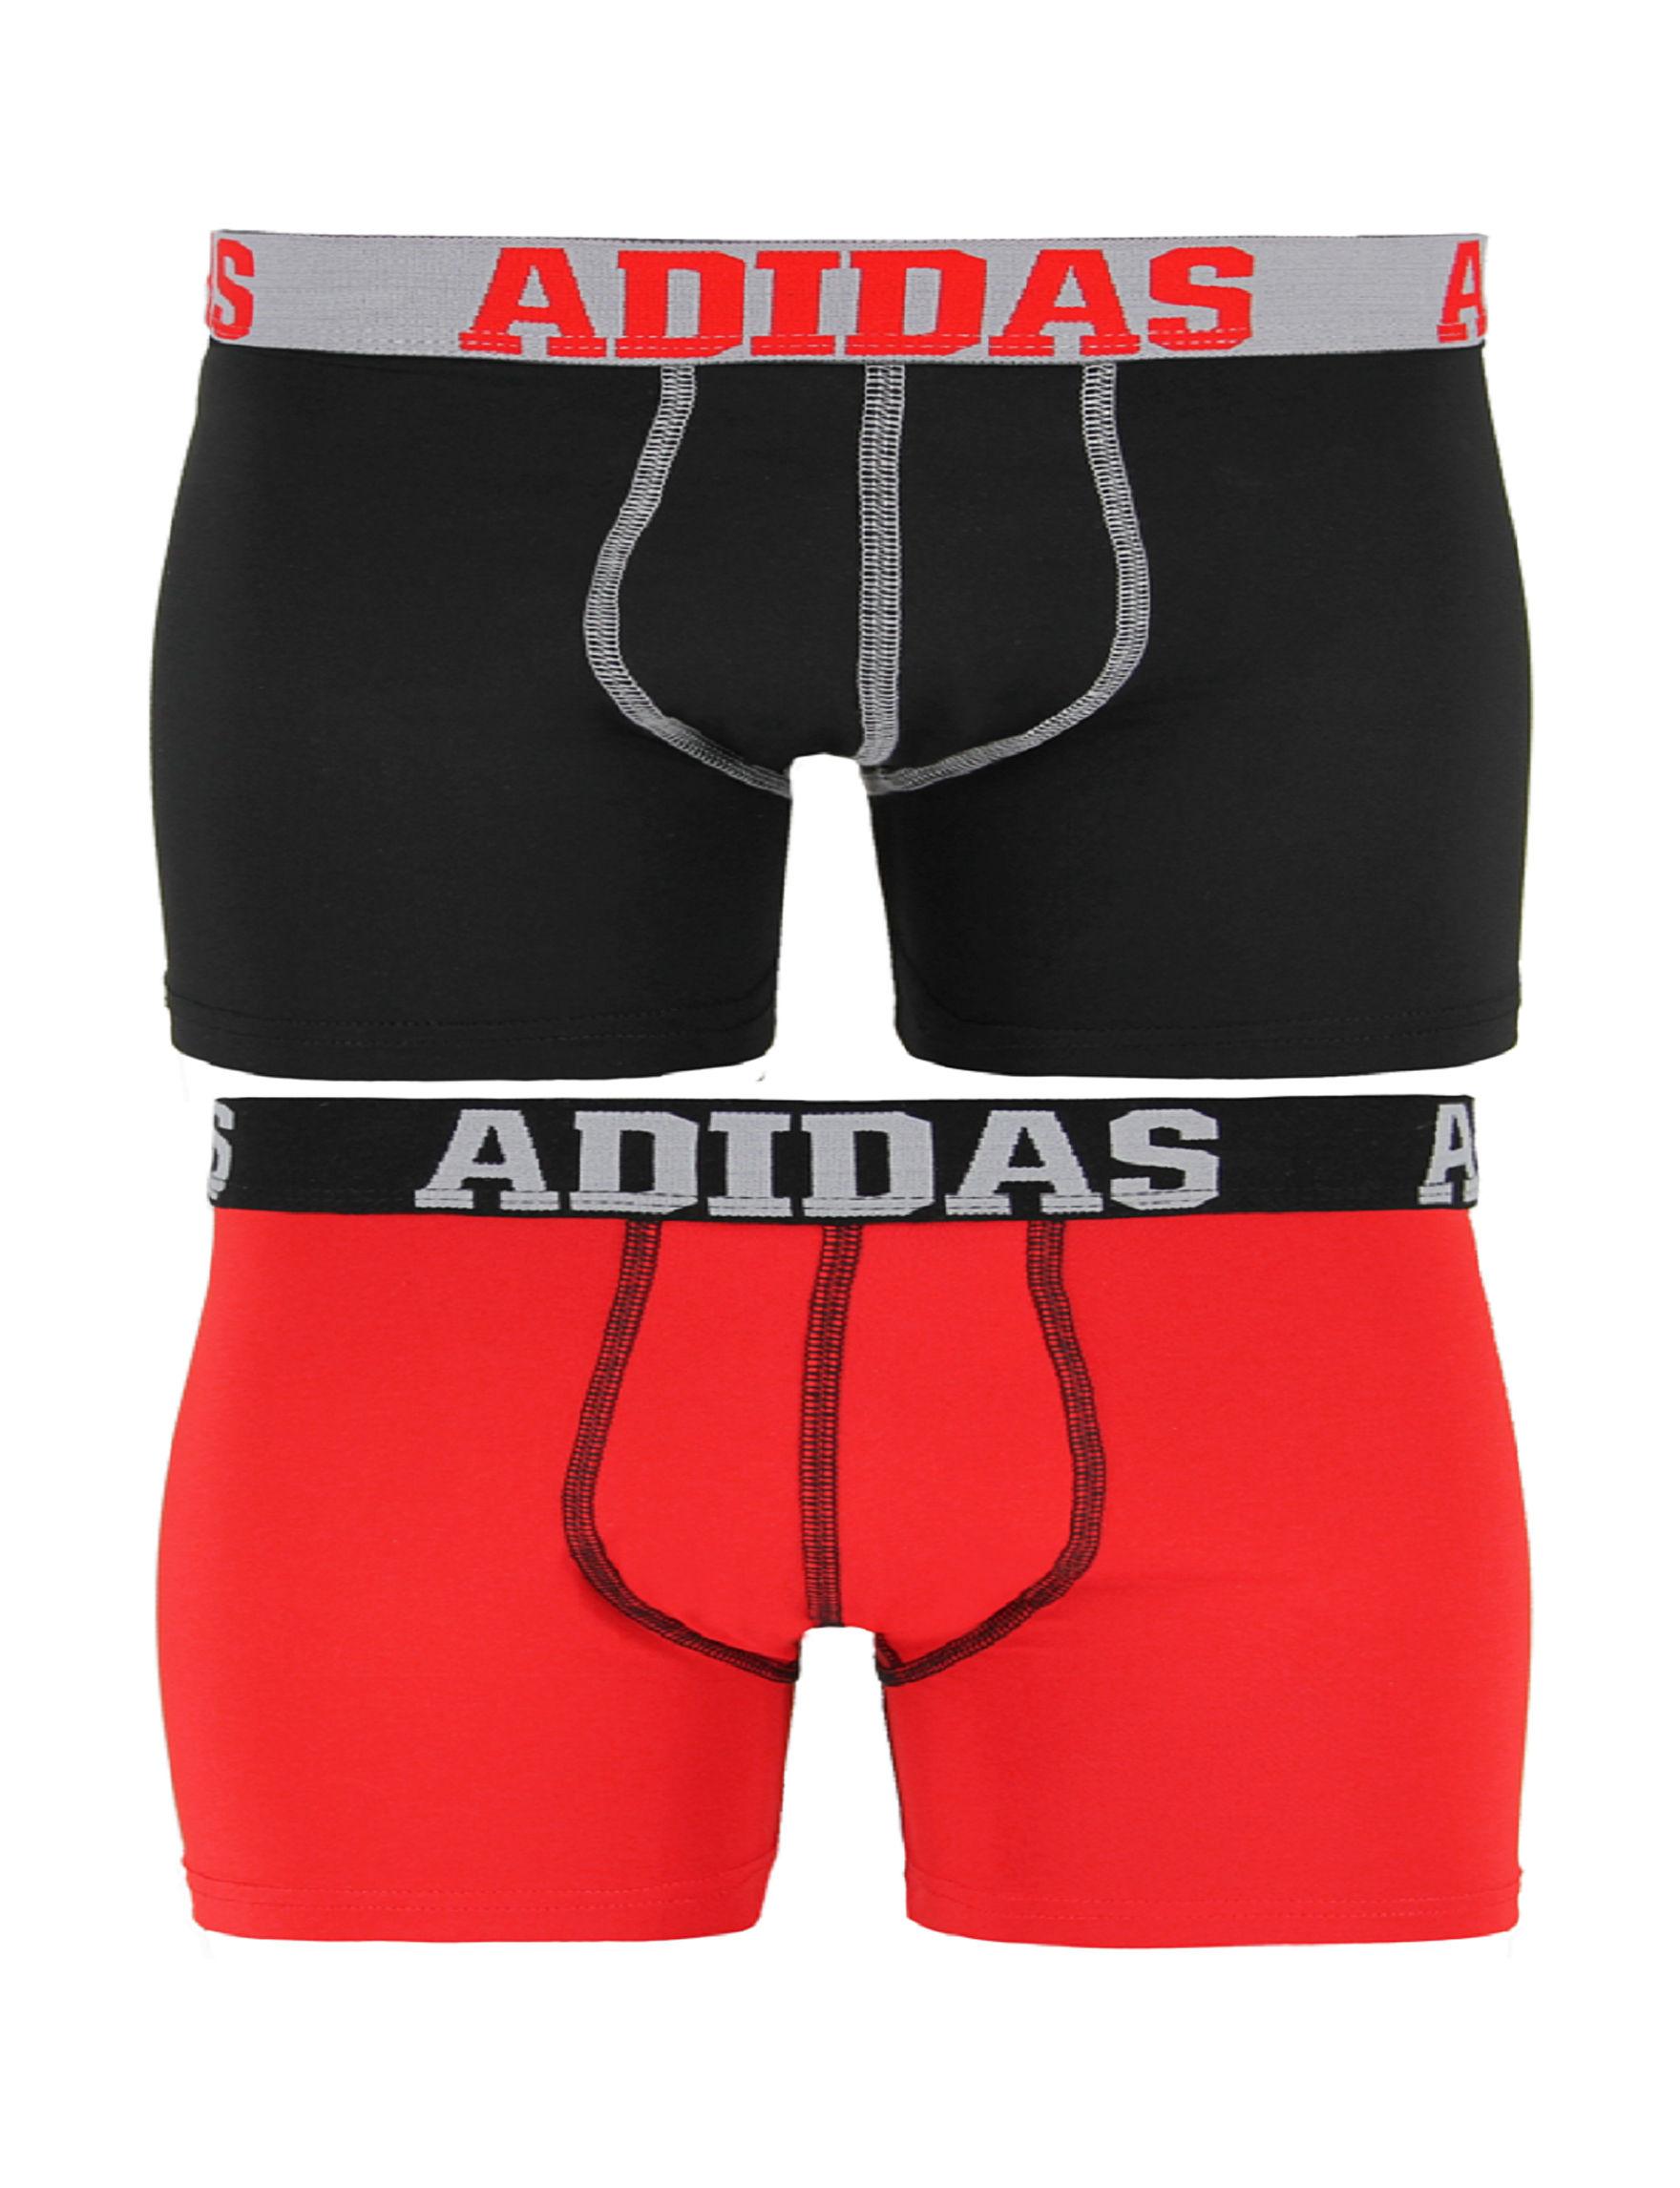 Adidas Black Boxer Briefs